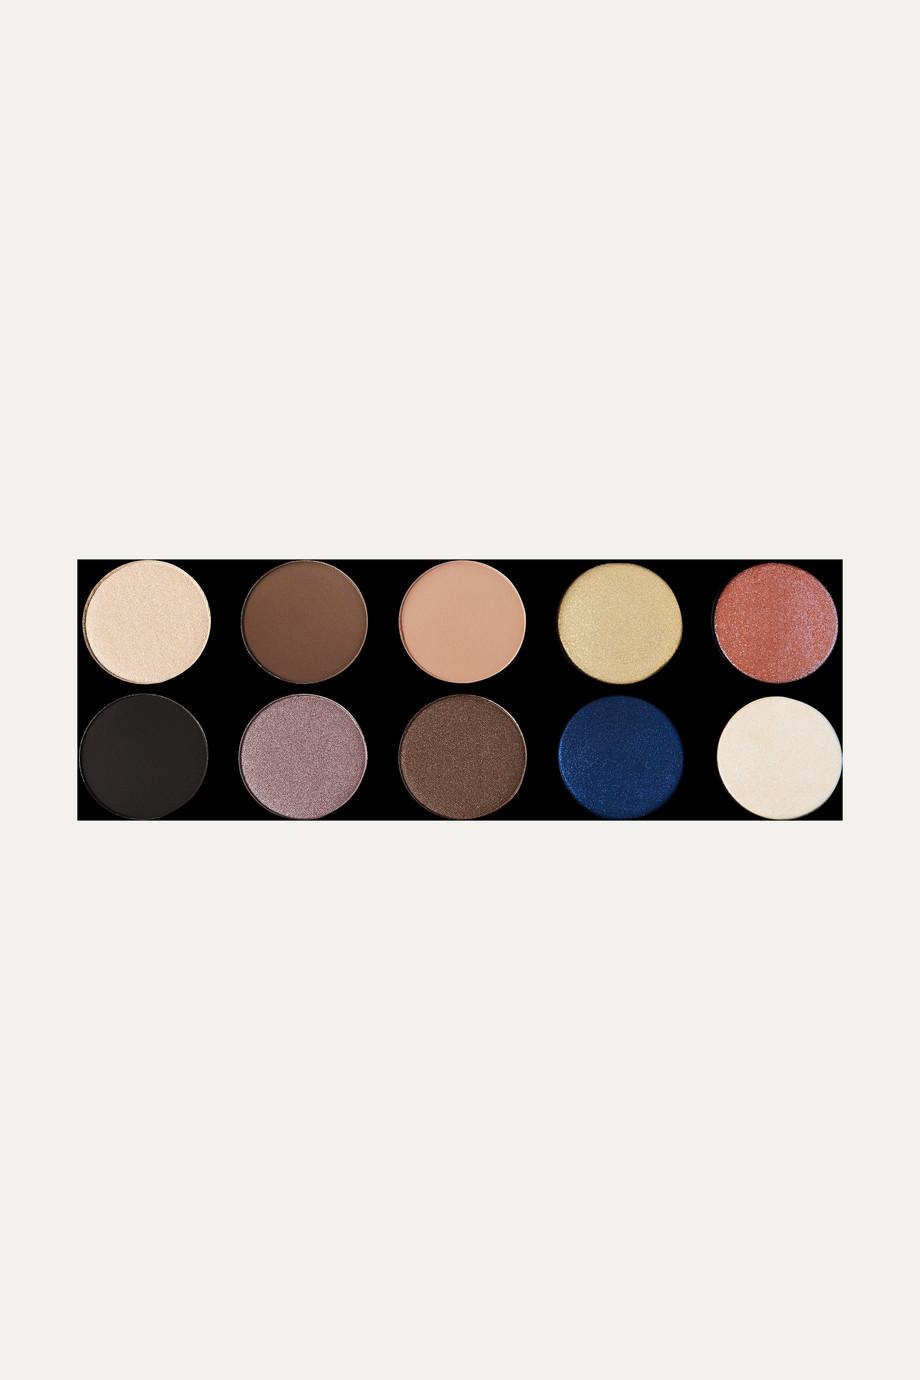 Pat McGrath Labs Mothership I Eyeshadow Palette - Subliminal